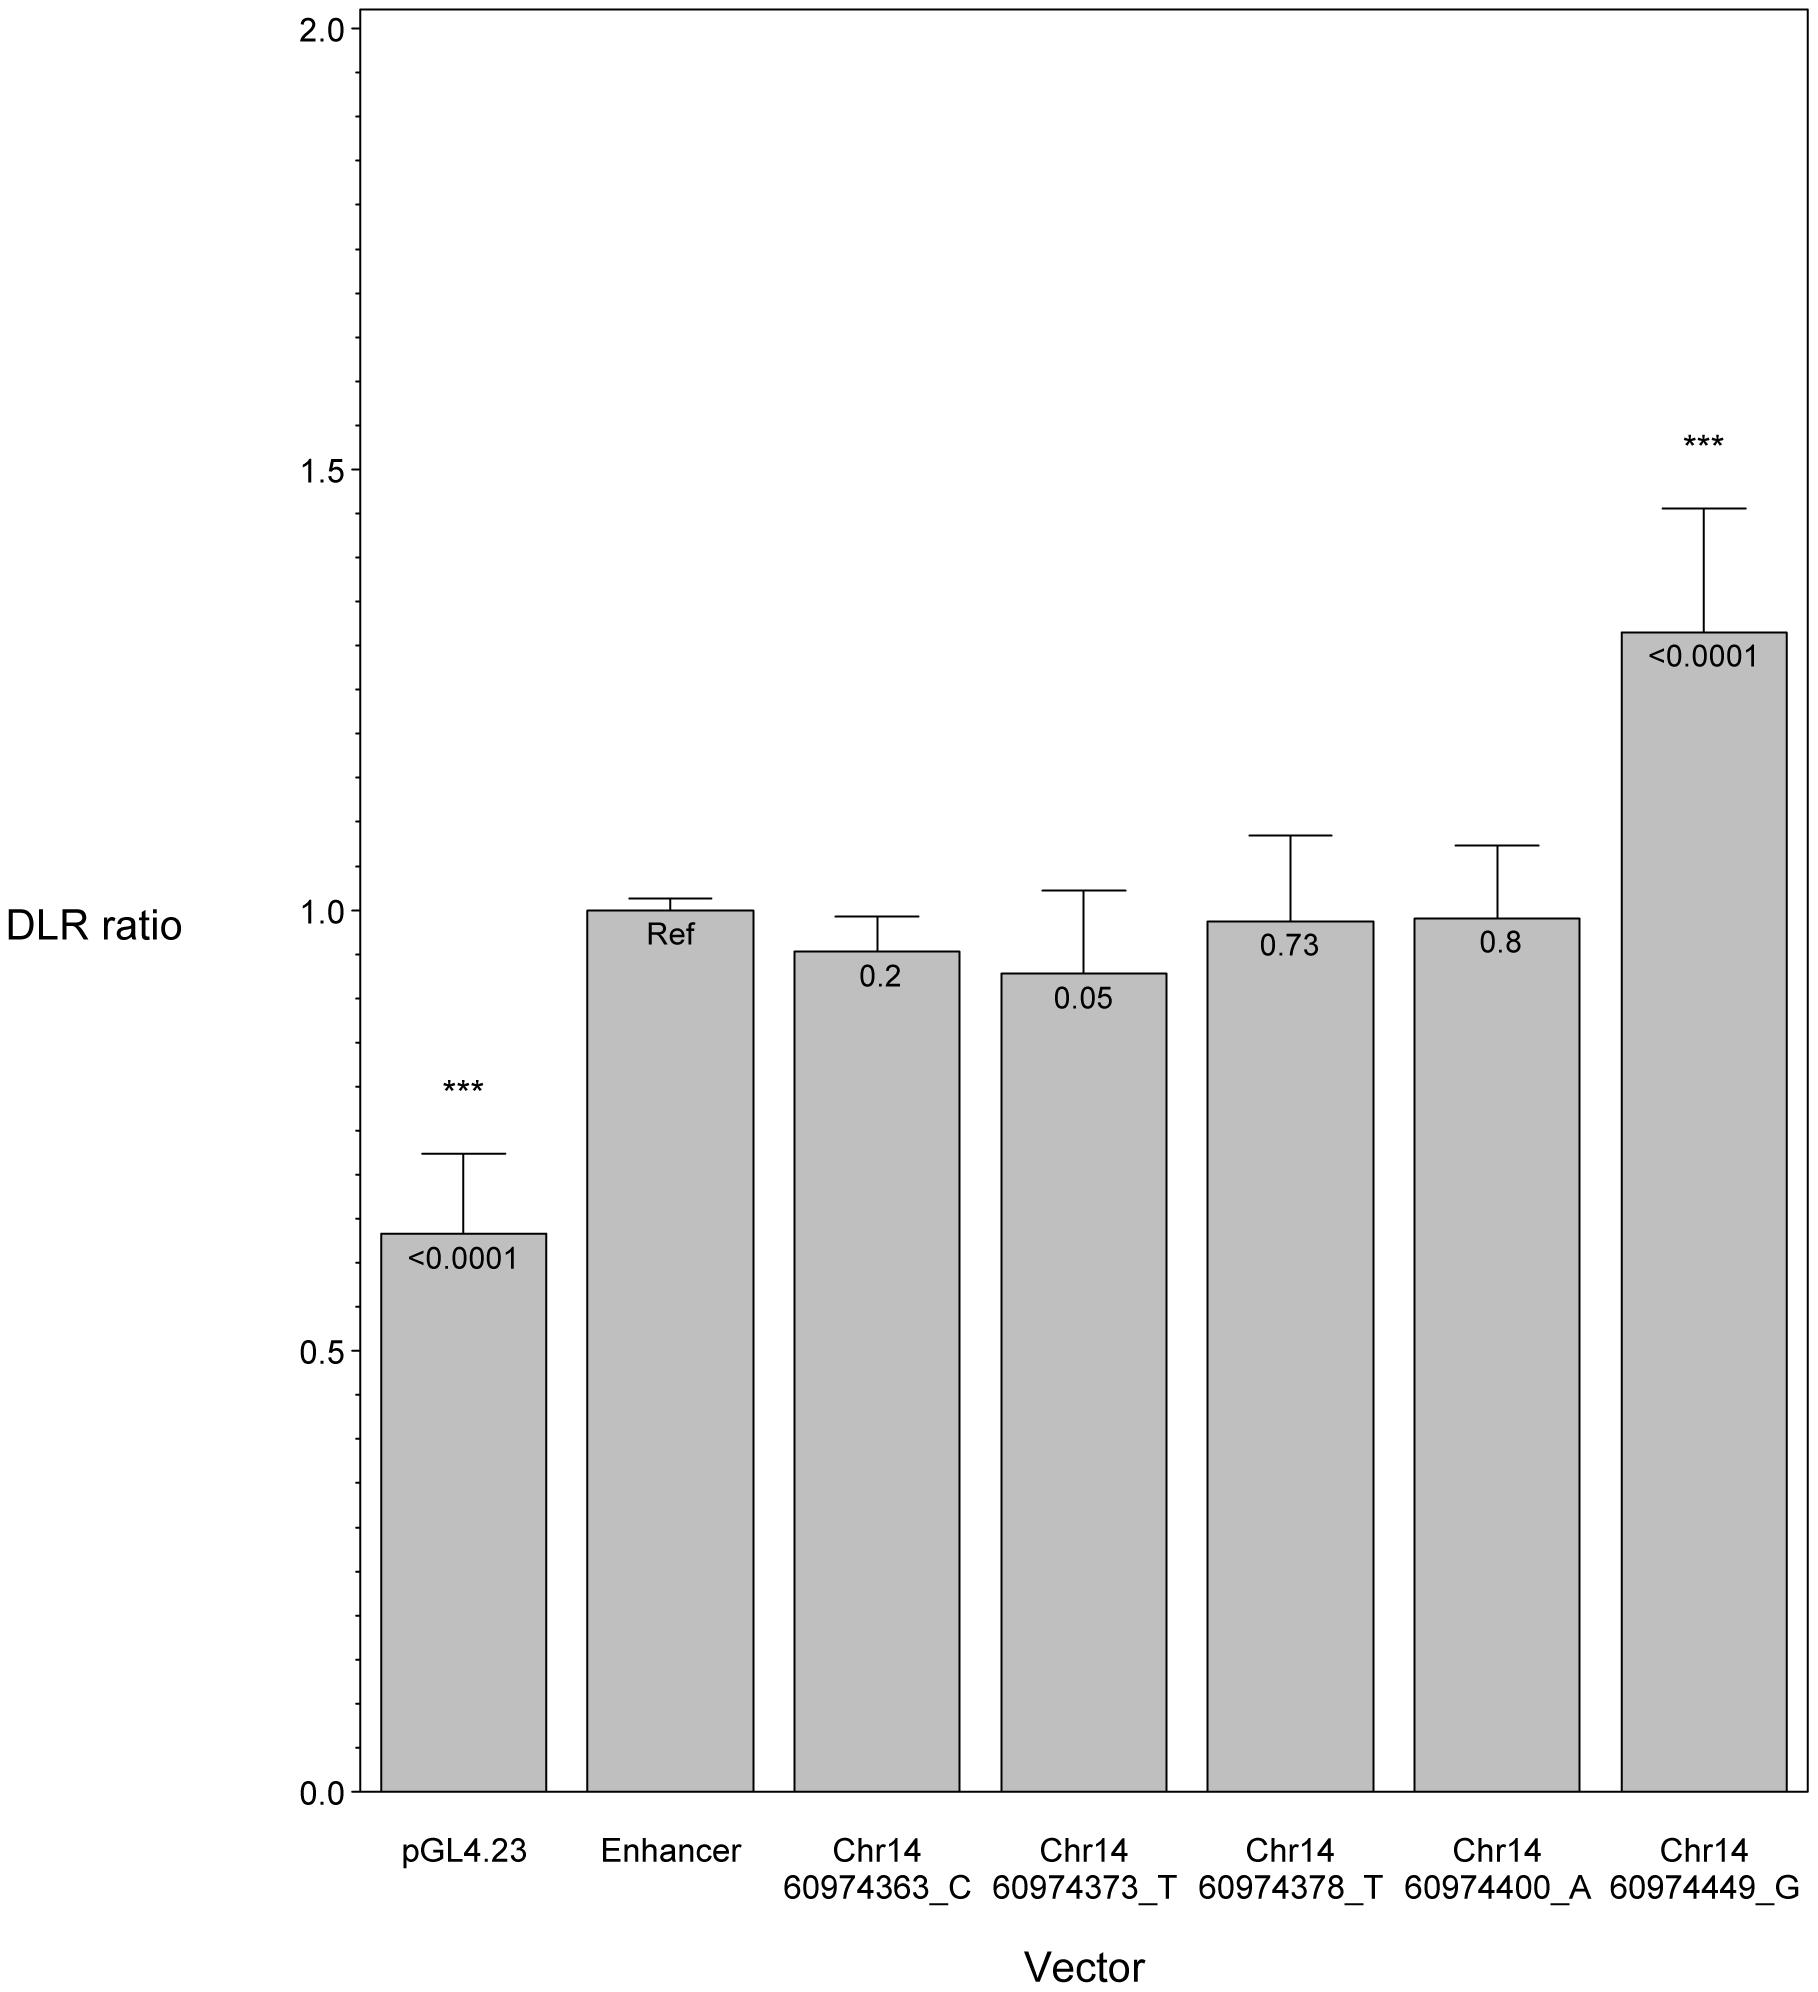 <i>In vitro</i> luciferase assay results showing the effect of <i>SIX6</i> enhancer variants.